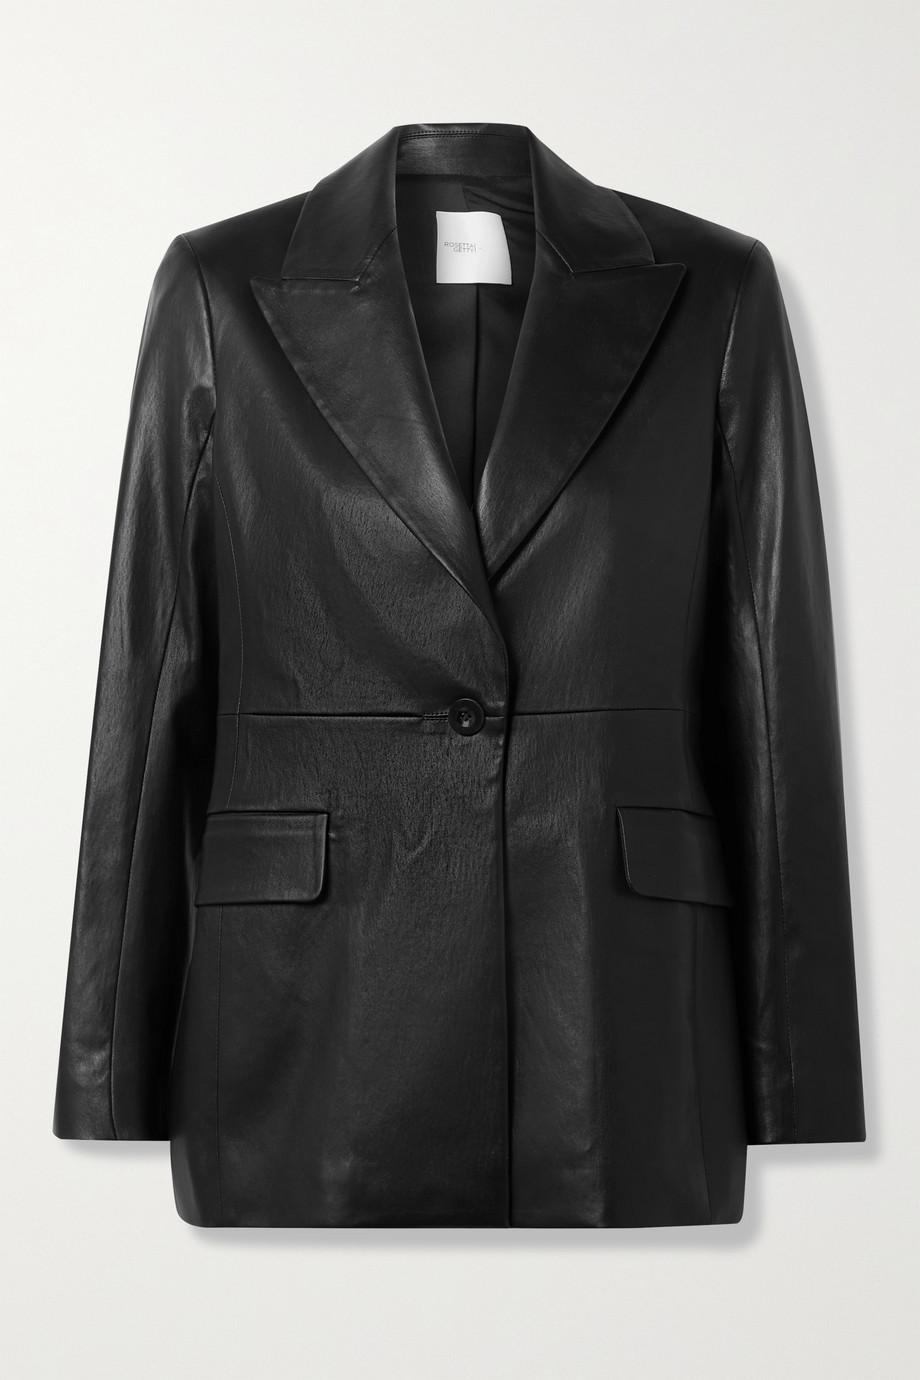 Rosetta Getty Leather blazer